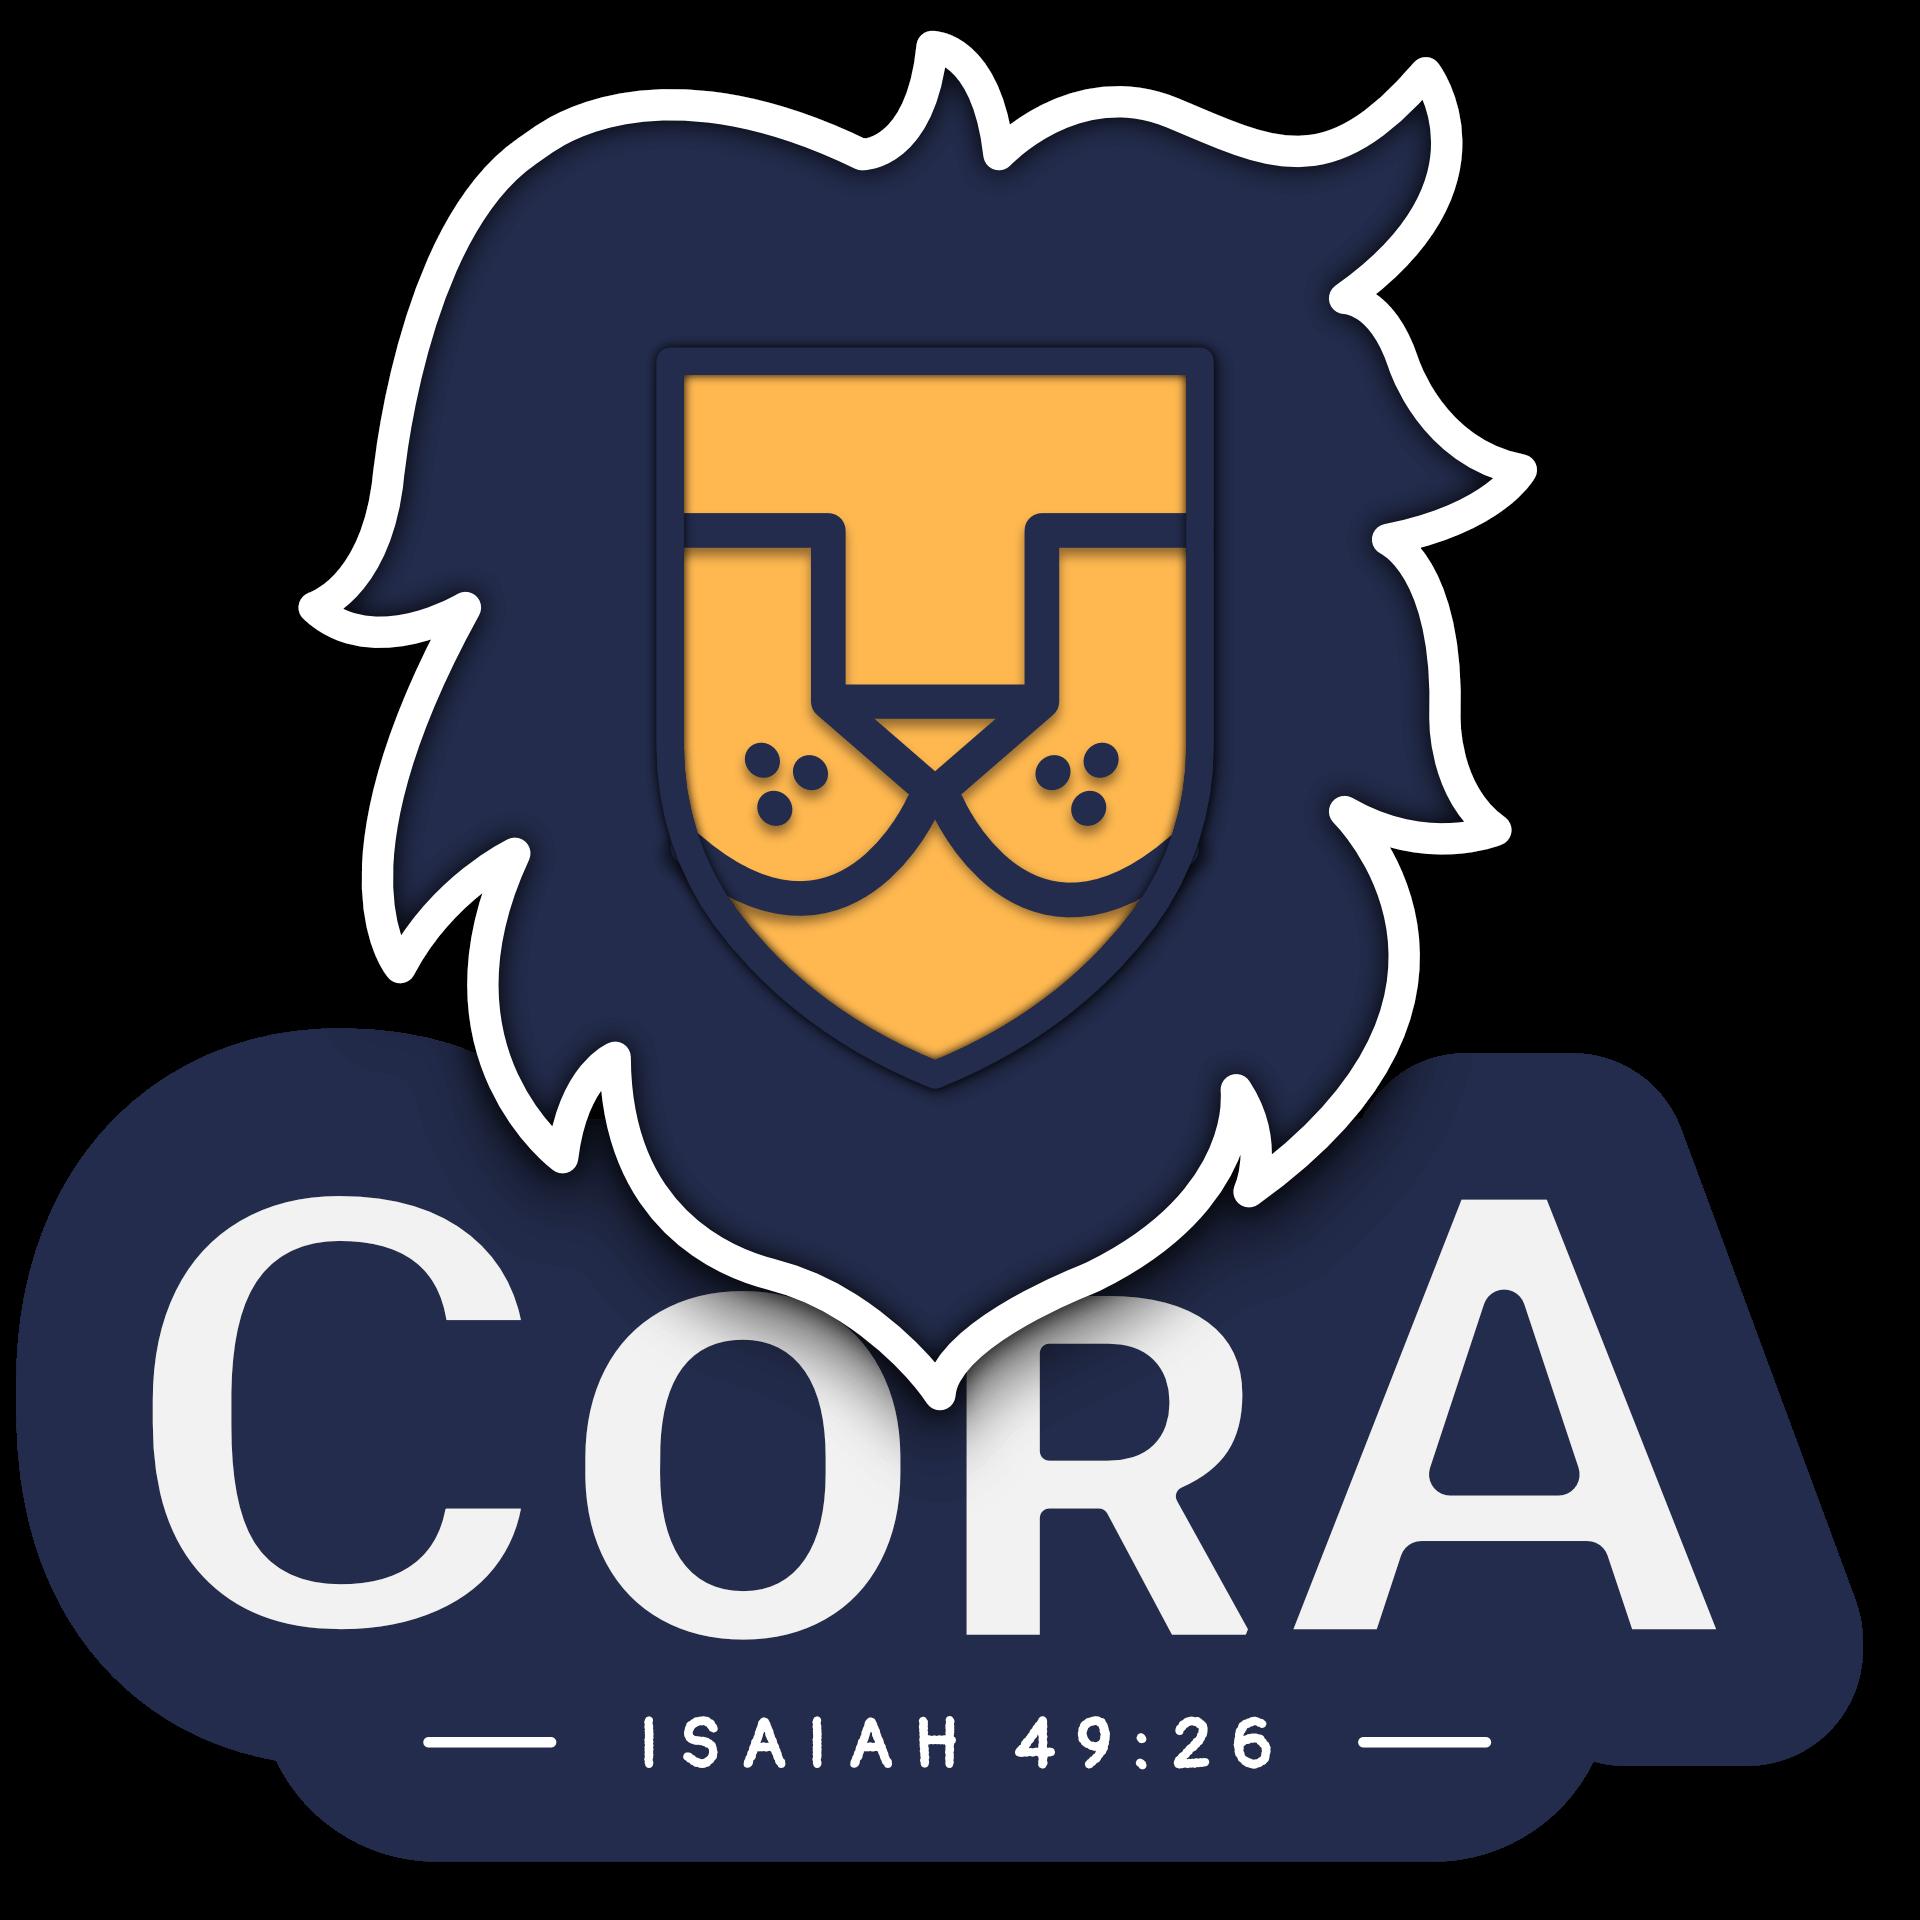 Christ Our Redeemer Academy